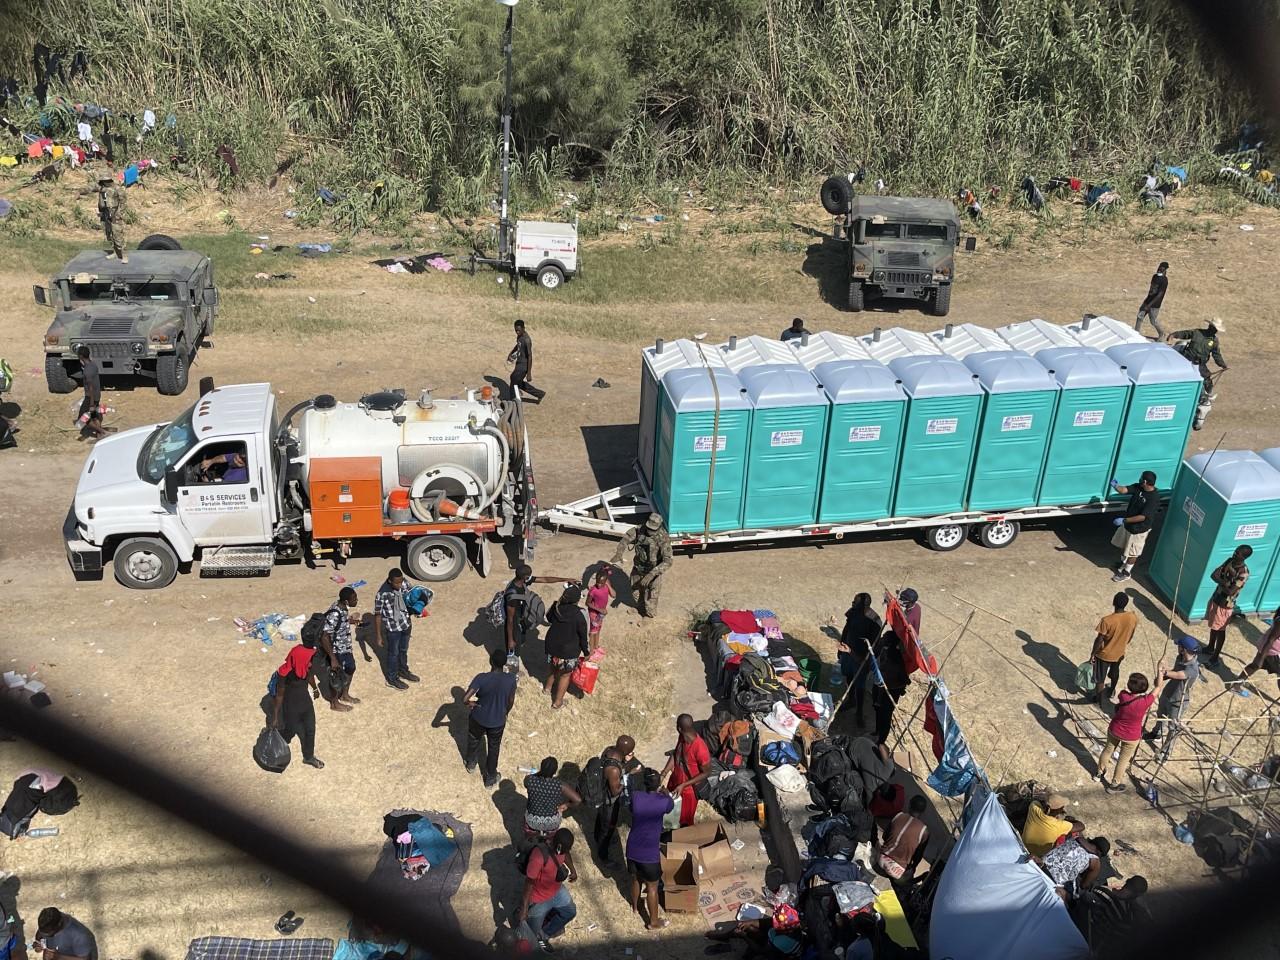 Thousands of migrants, most from Haiti, are living beneath the Del Rio International Bridge in Texas on Sept. 17, 2021. (Sandra Sanchez/Border Report Photo)